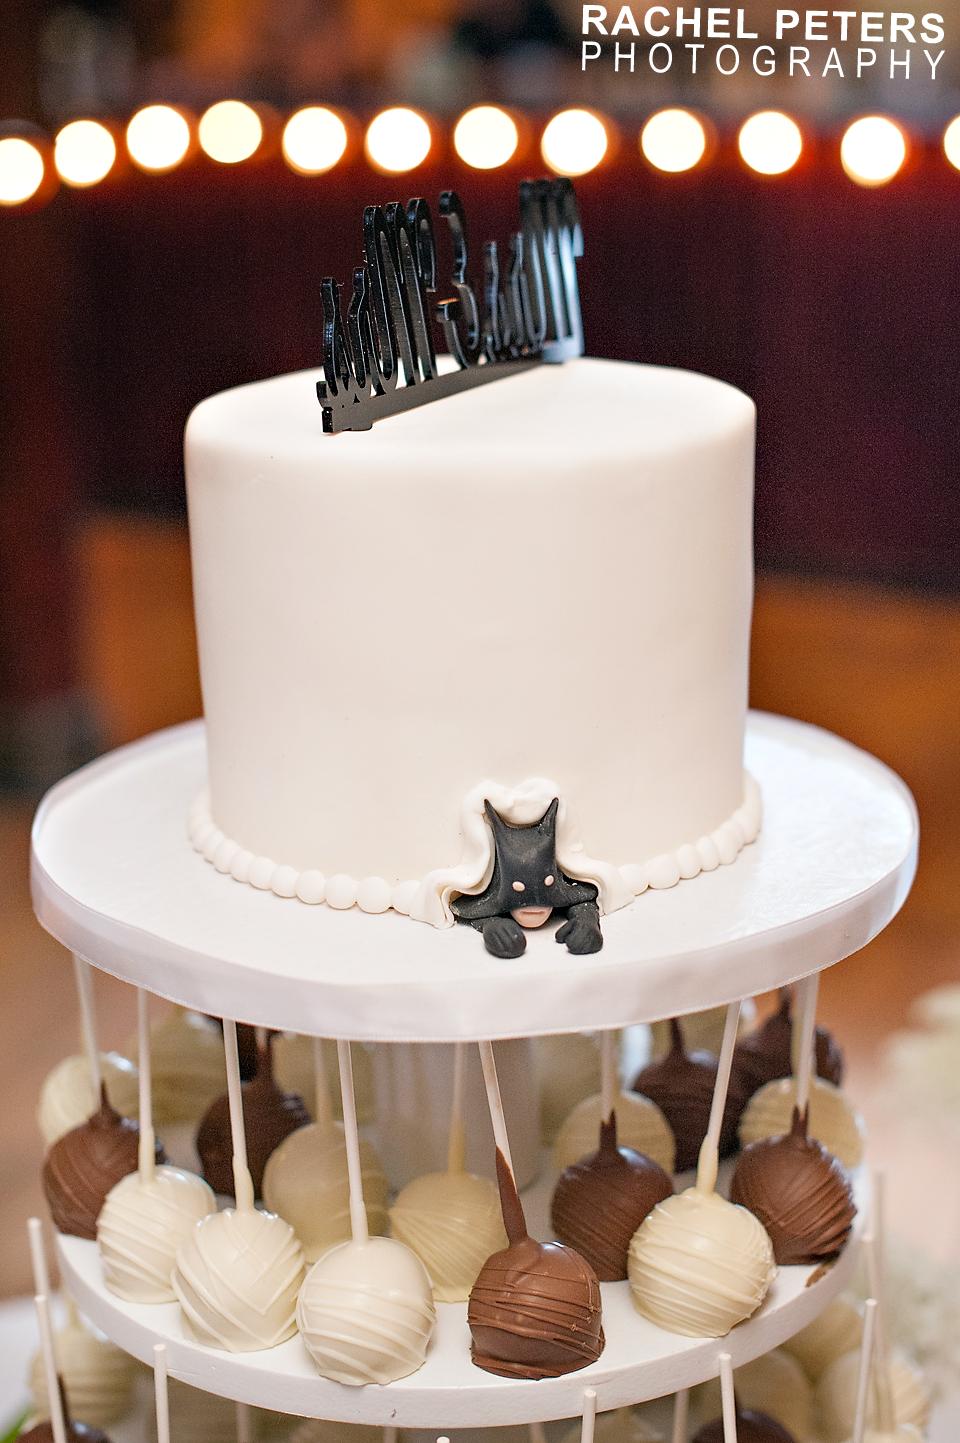 Batman Wedding Cake 84 Superb Lee loves Batman so